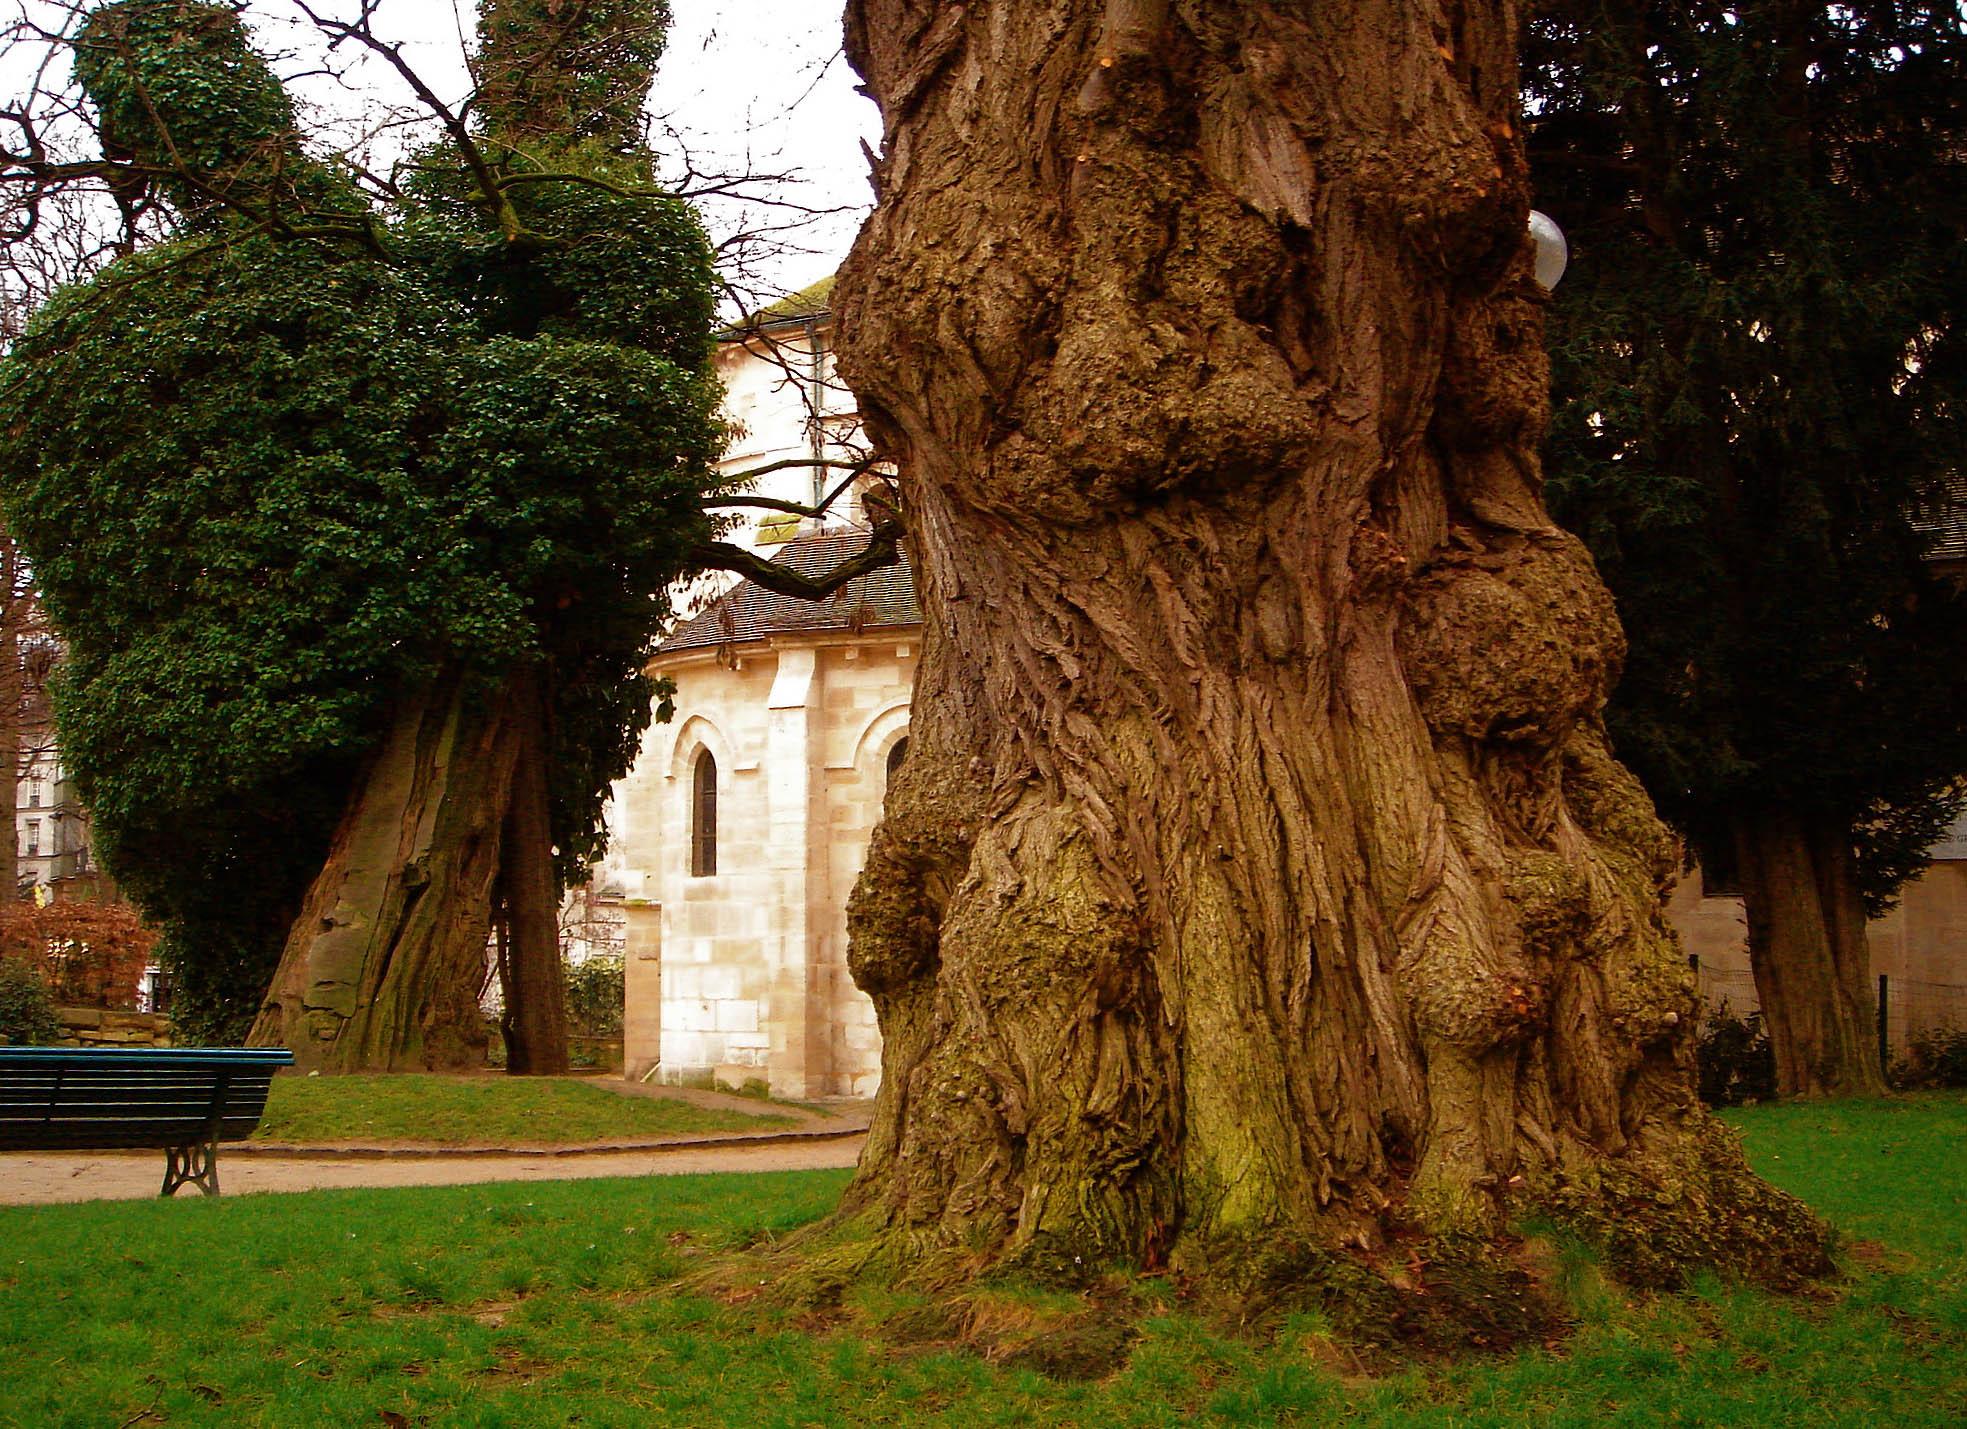 robinier faux acacia_by G@ttoGiallo (https://www.flickr.com/photos/gattogiallo/)